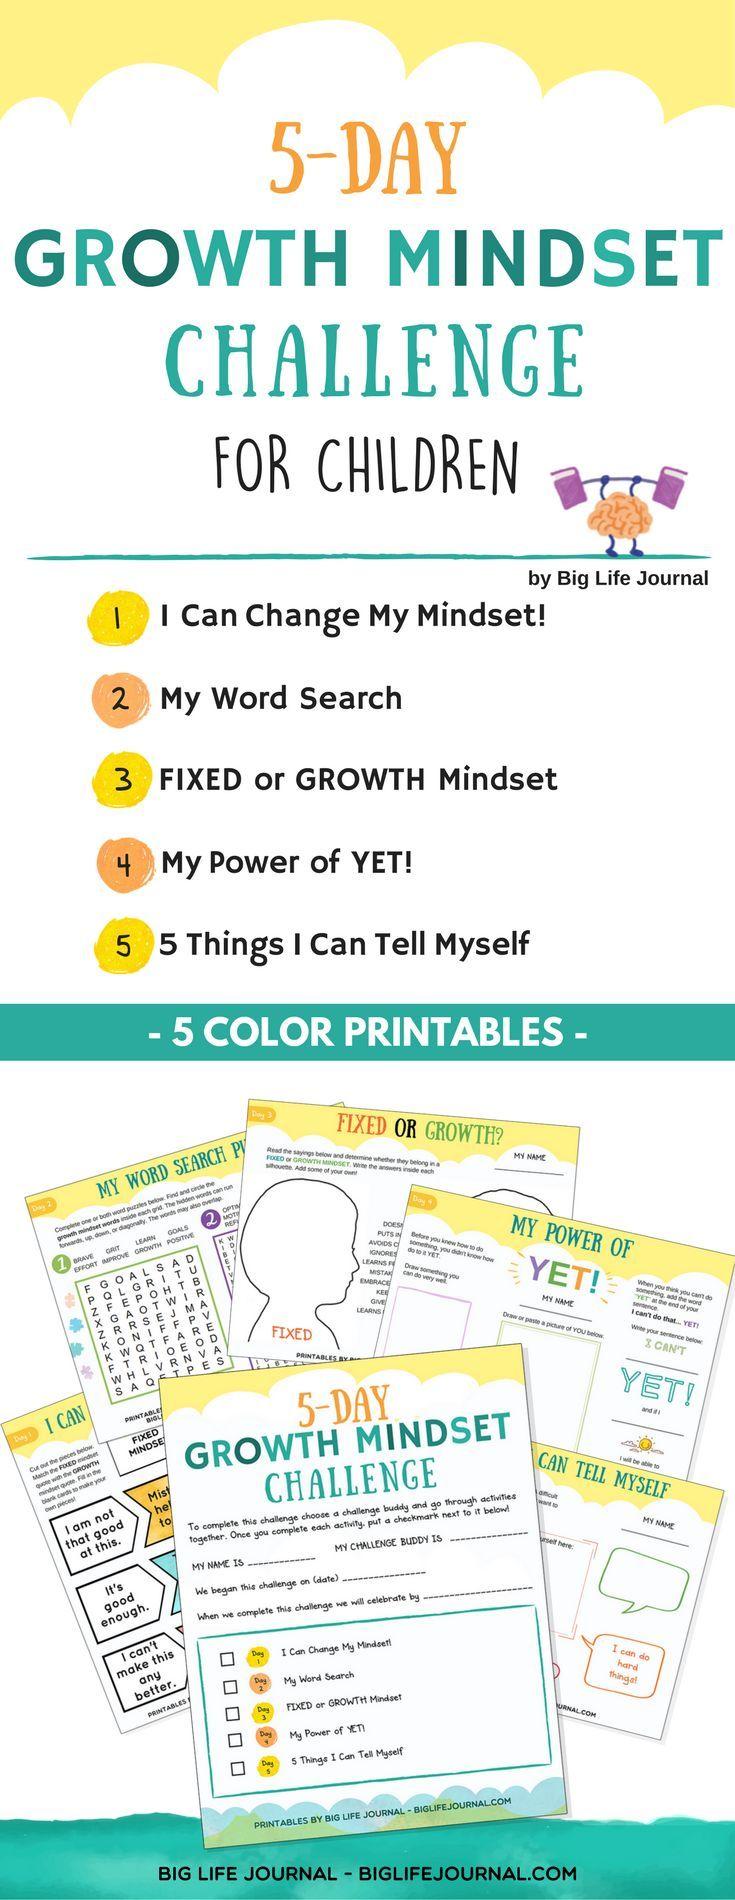 5-Day Growth Mindset Challenge for Children – Big Life Journal